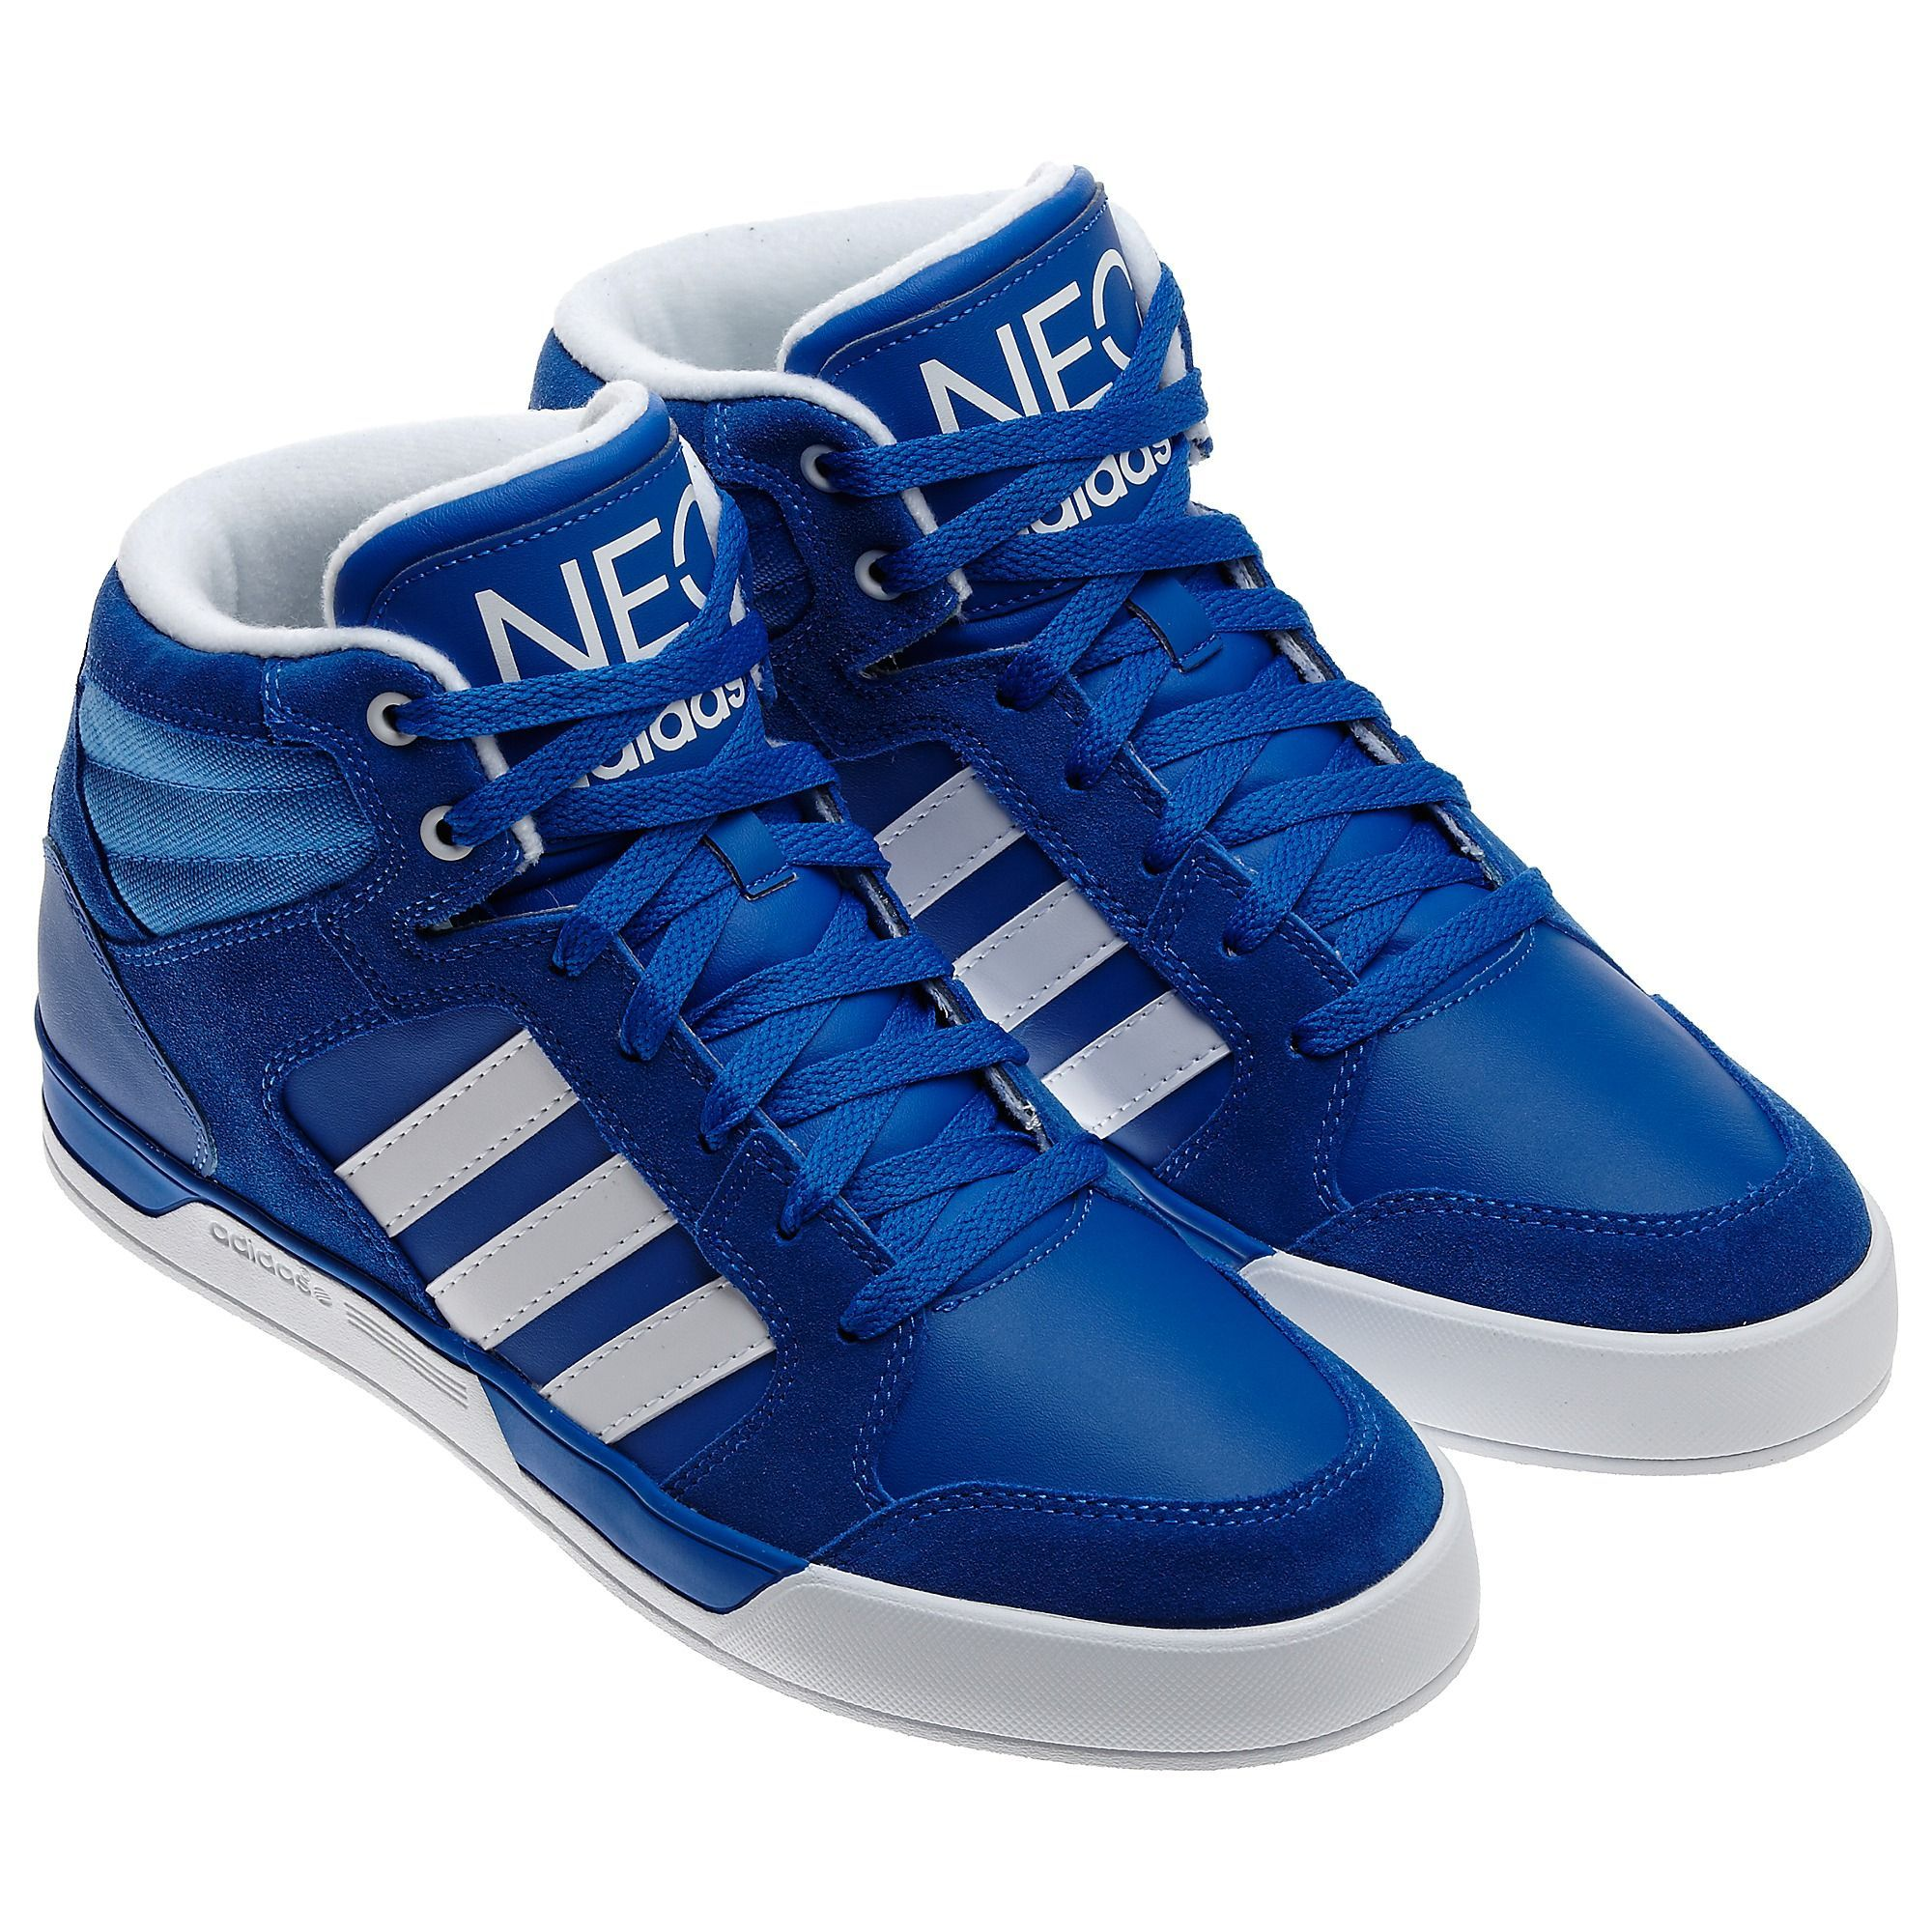 adidas bbneo raleigh metà scarpe pinterest adidas